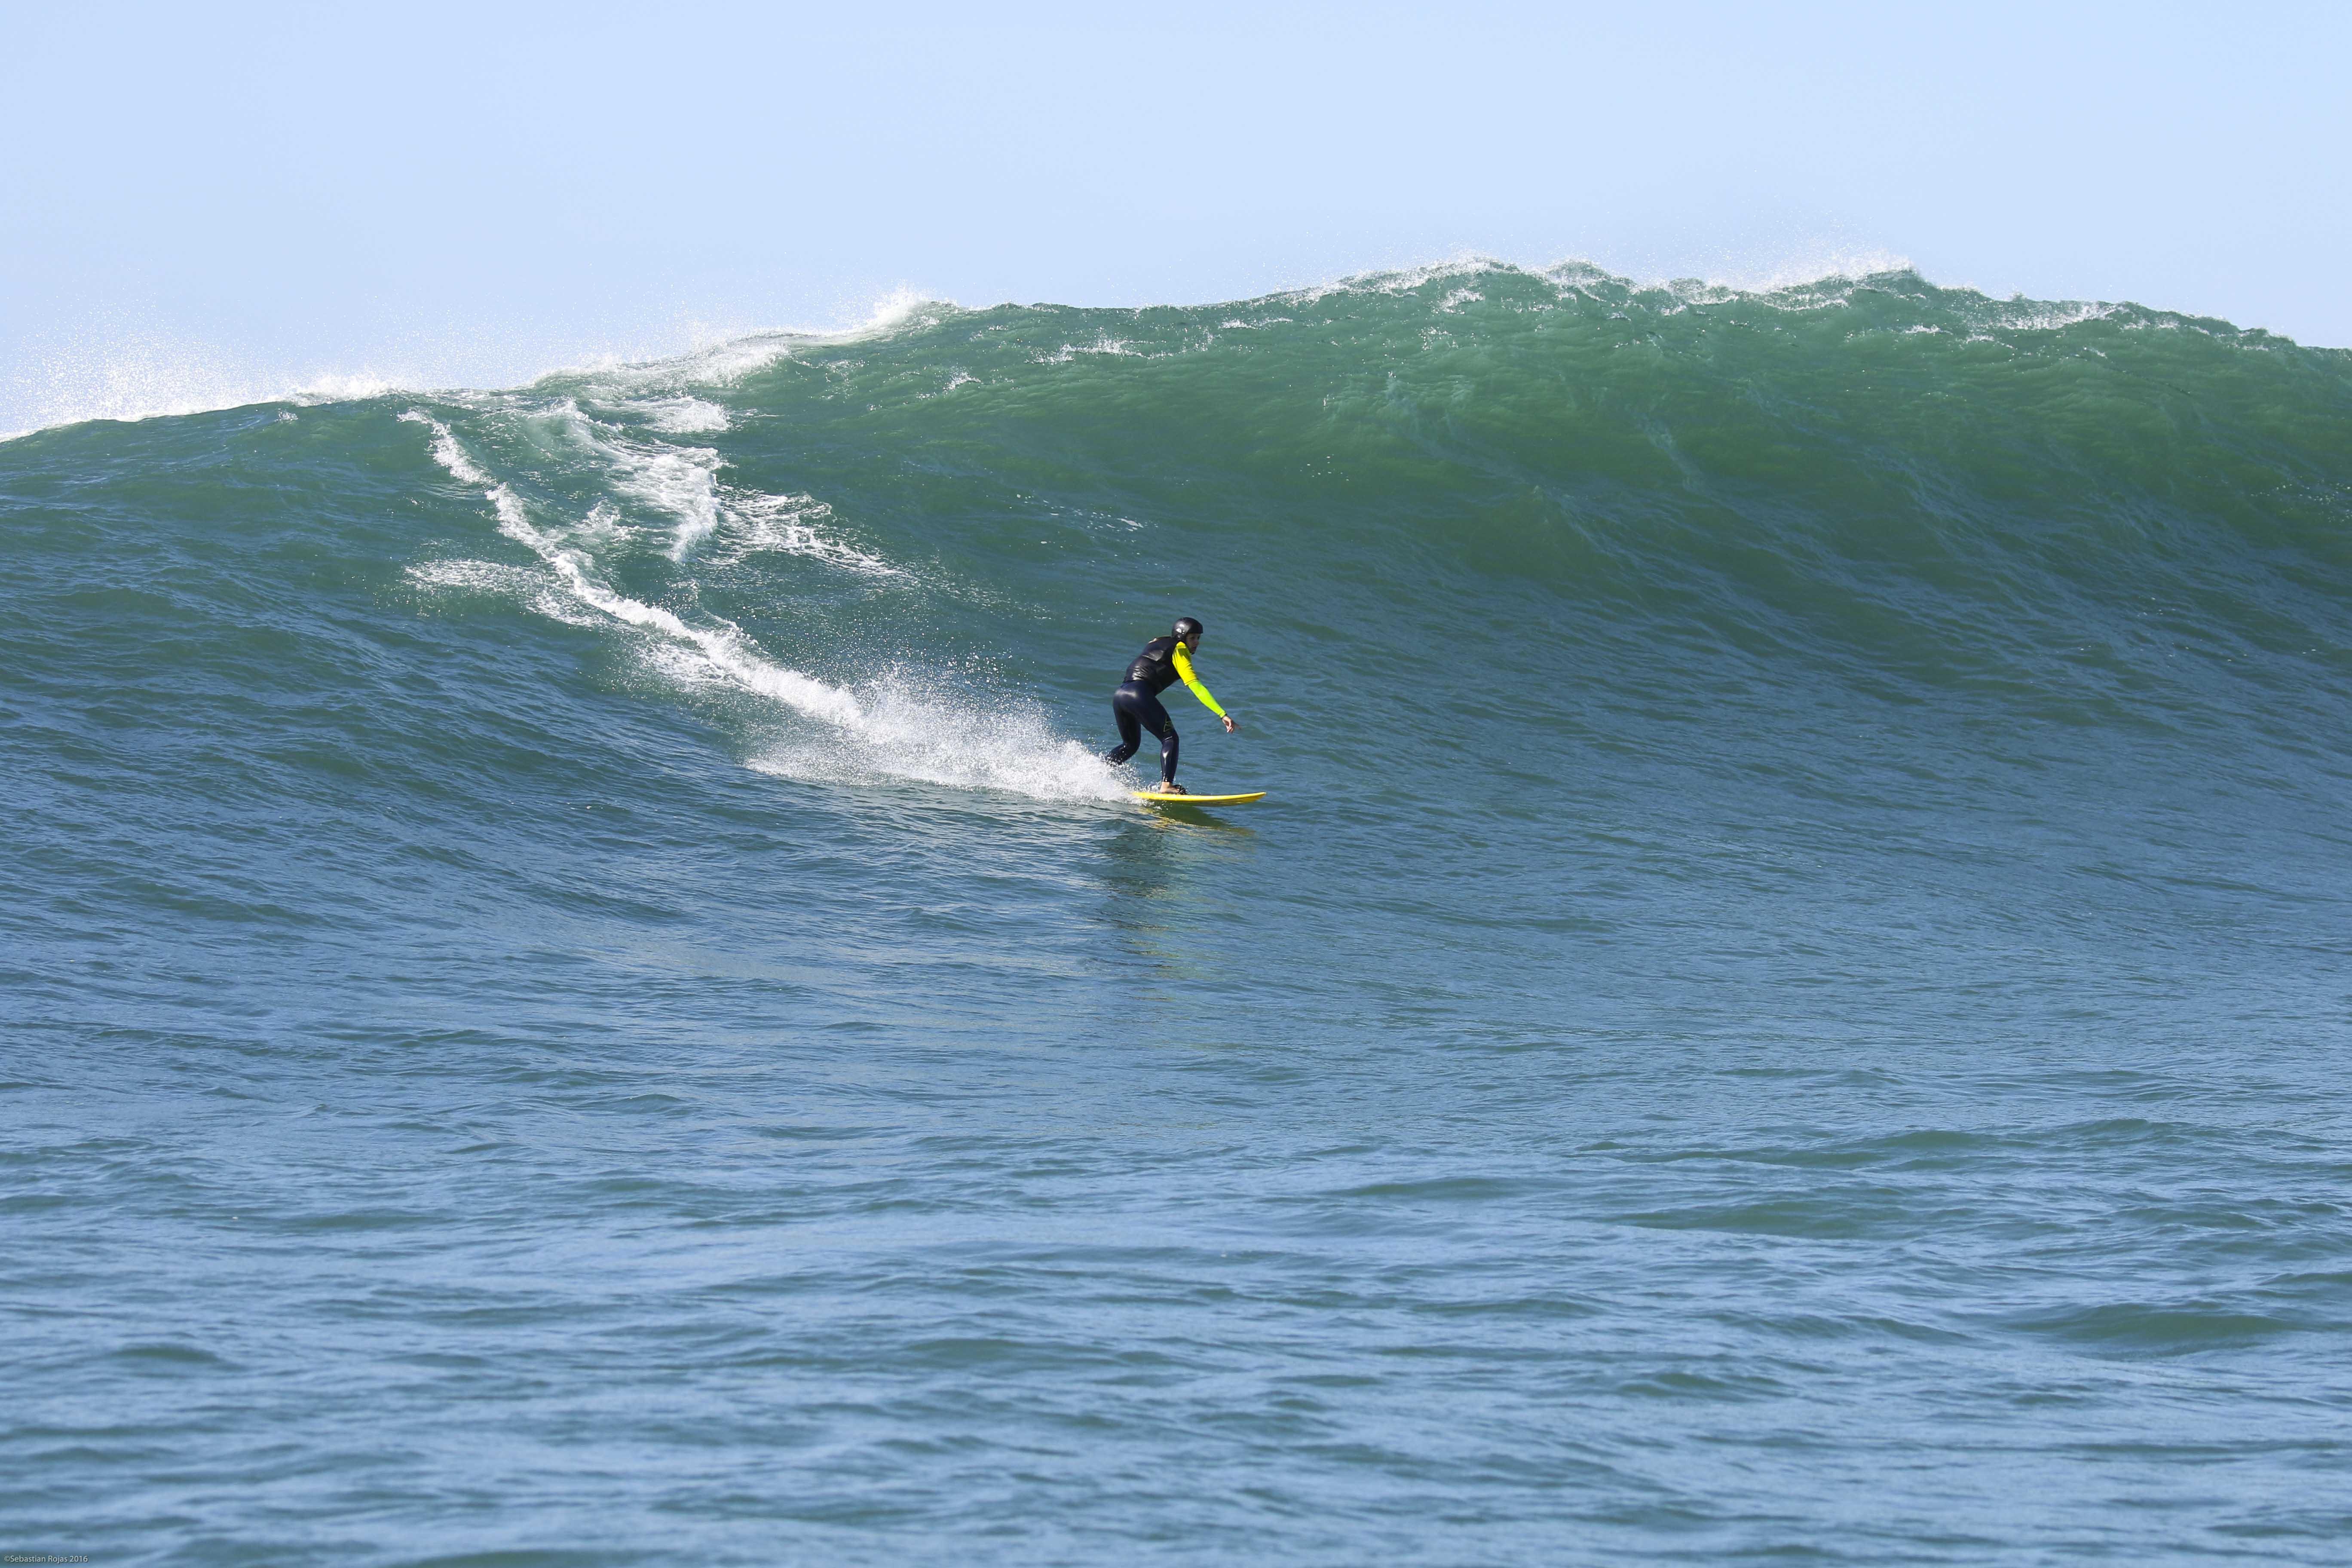 Louise Meneghetti surfa ondas gigantes na Laje da Jagua (SC). Fotos: Sebastian Rojas.